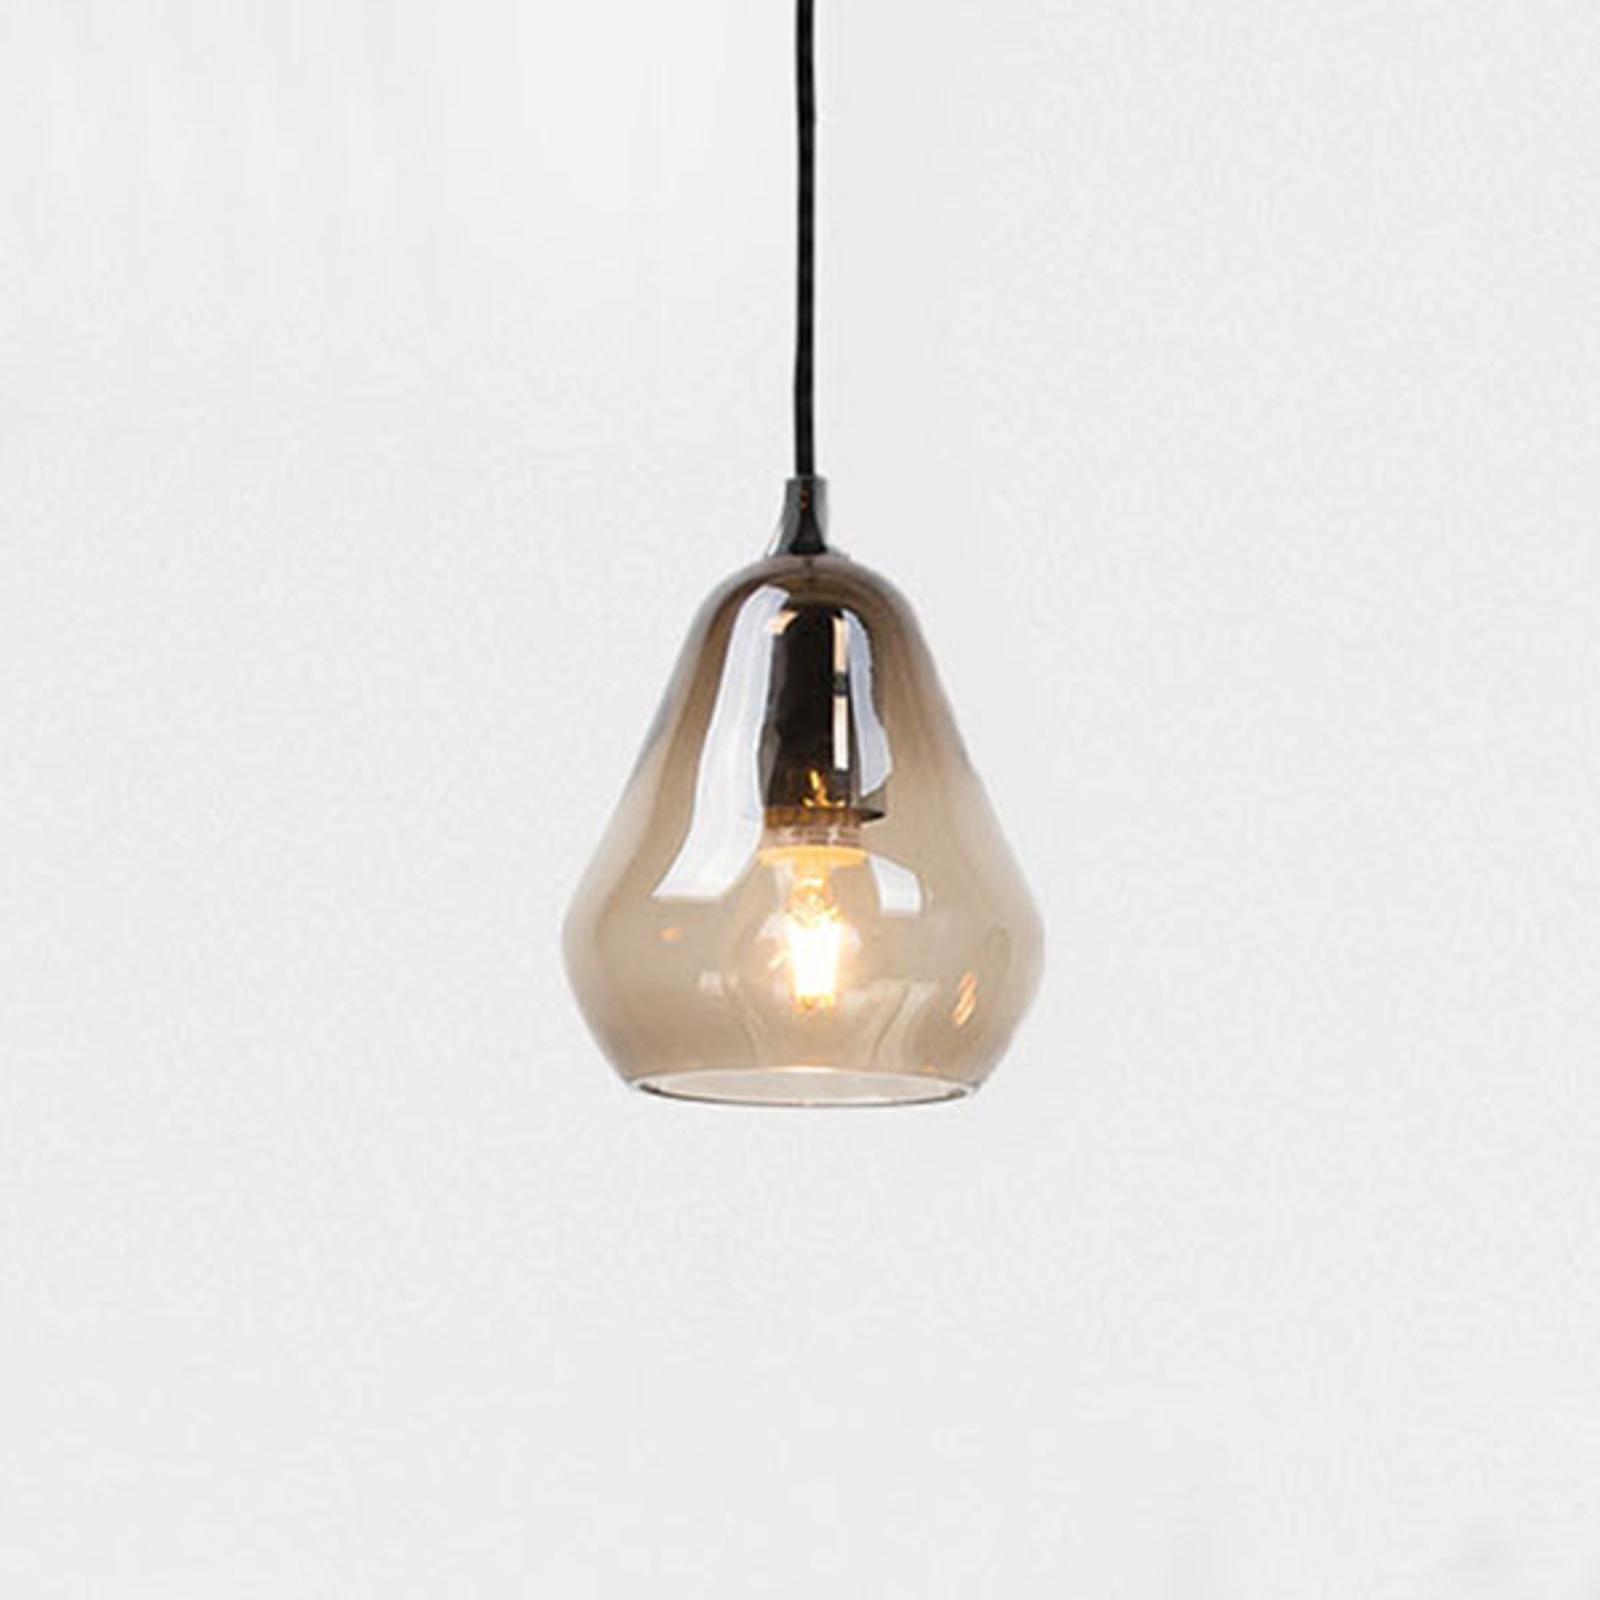 Innermost Core 15 - szklana lampa wisząca, szara